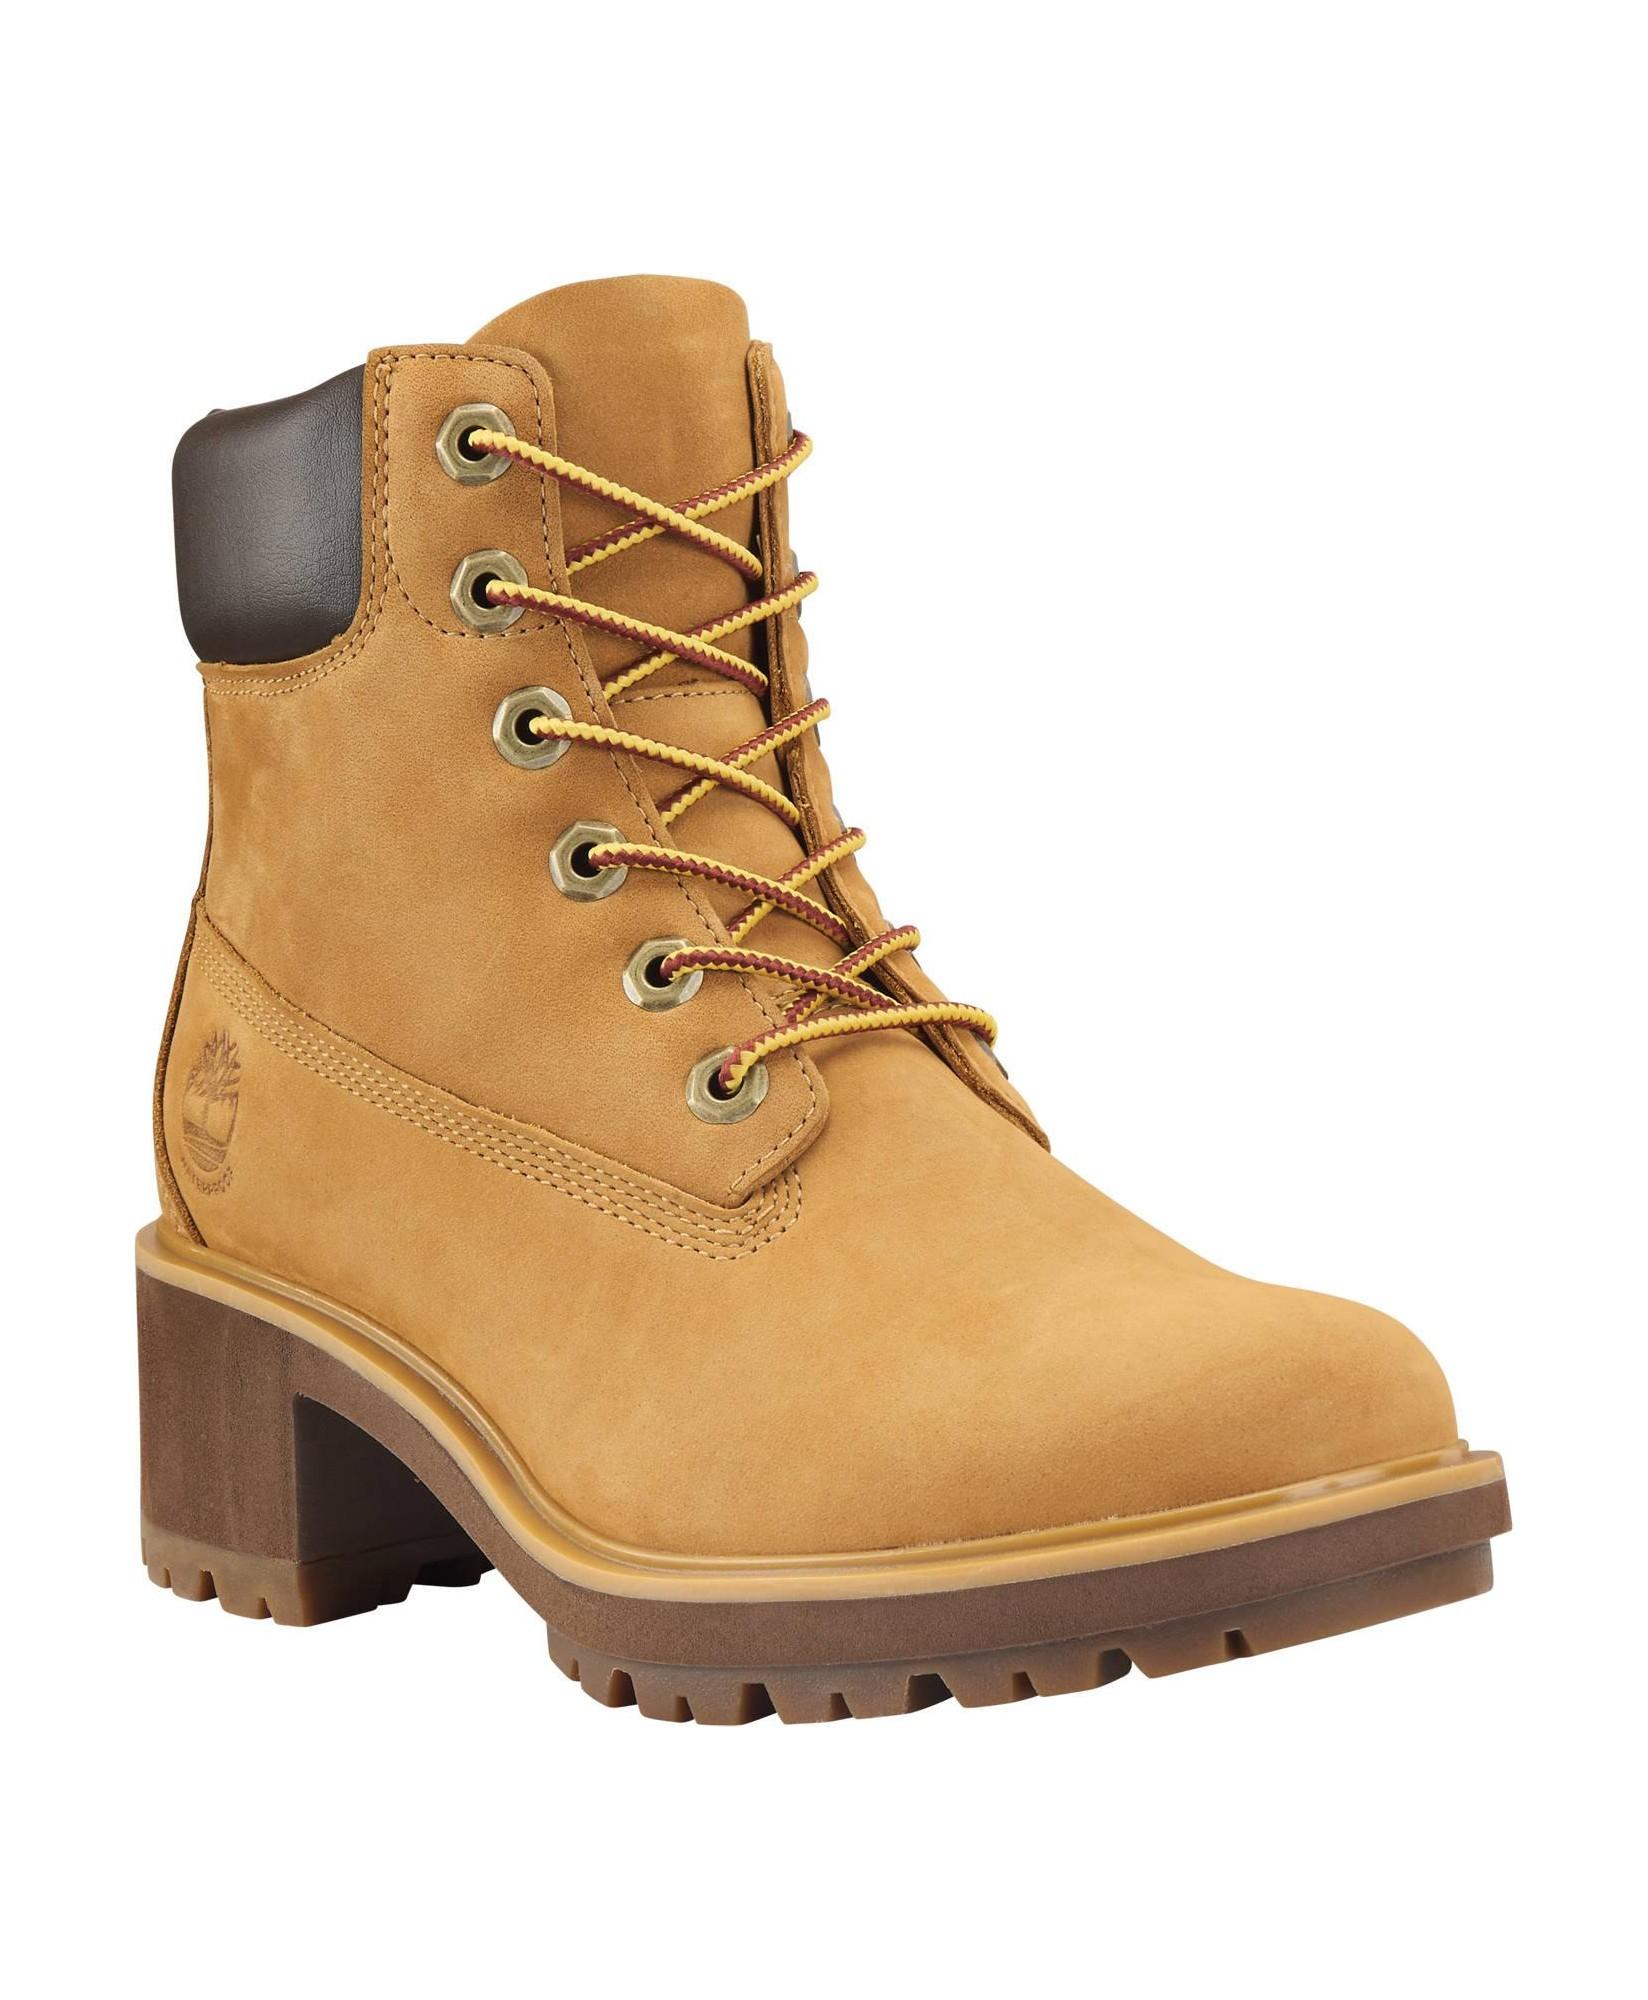 Kinsley 6 Inch Waterproof Boot WHEAT_TB0A25BS2311_7.5_231 Kinsley 6 Inch Waterproof Boot WHEAT_TB0A25BS2311_7.5_231